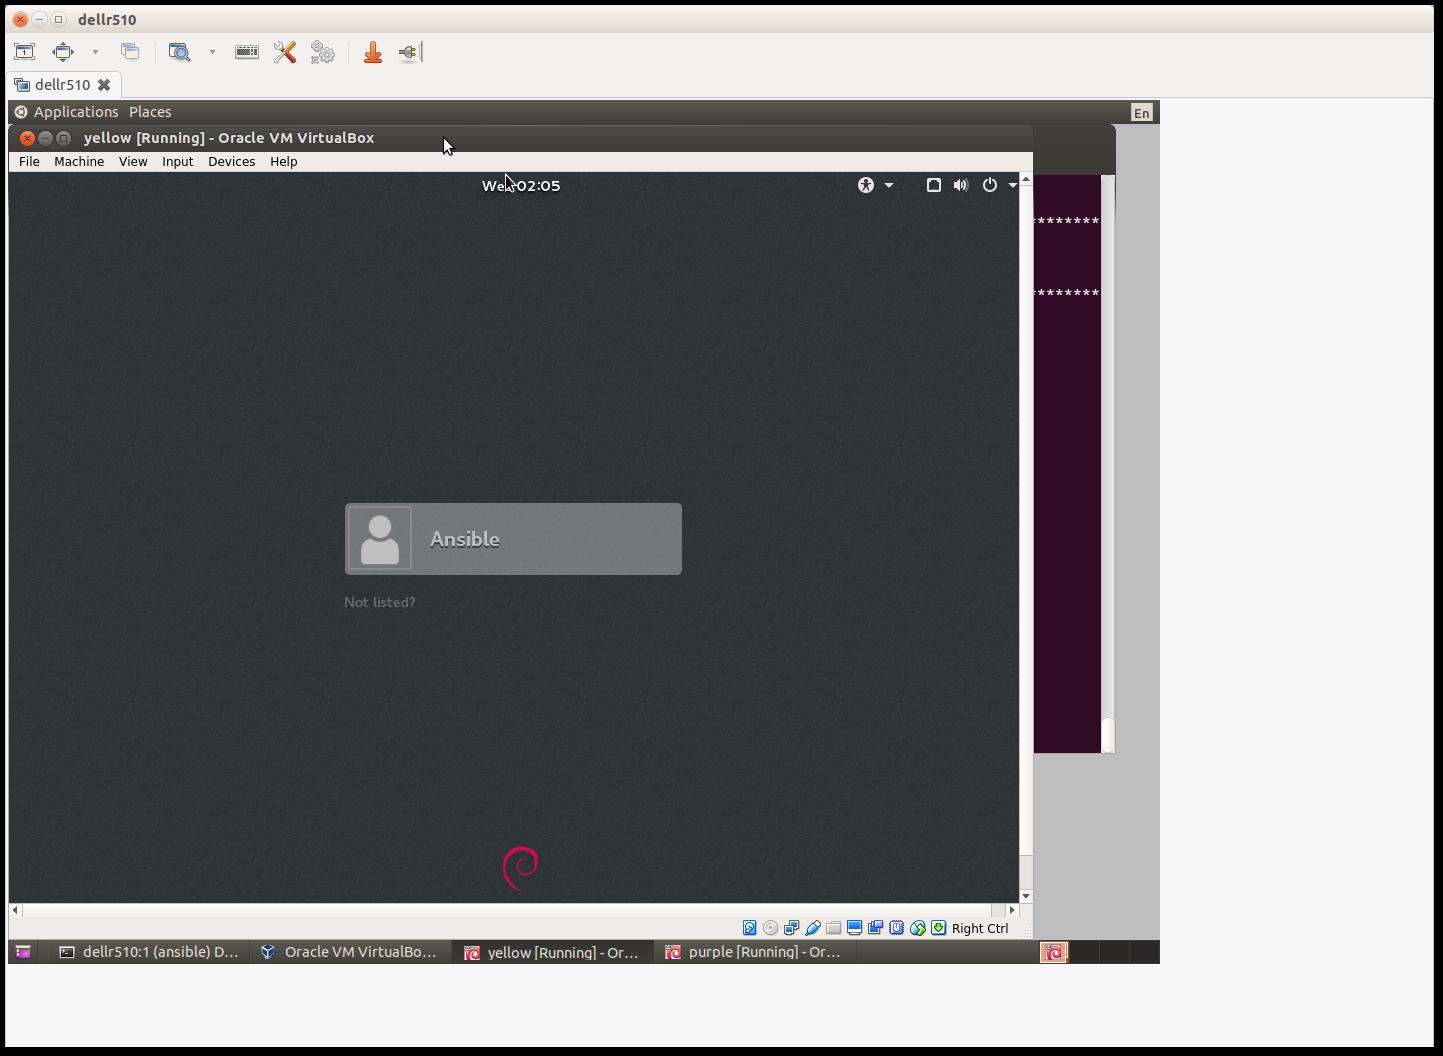 Login screen for yellow VM 4 Developing